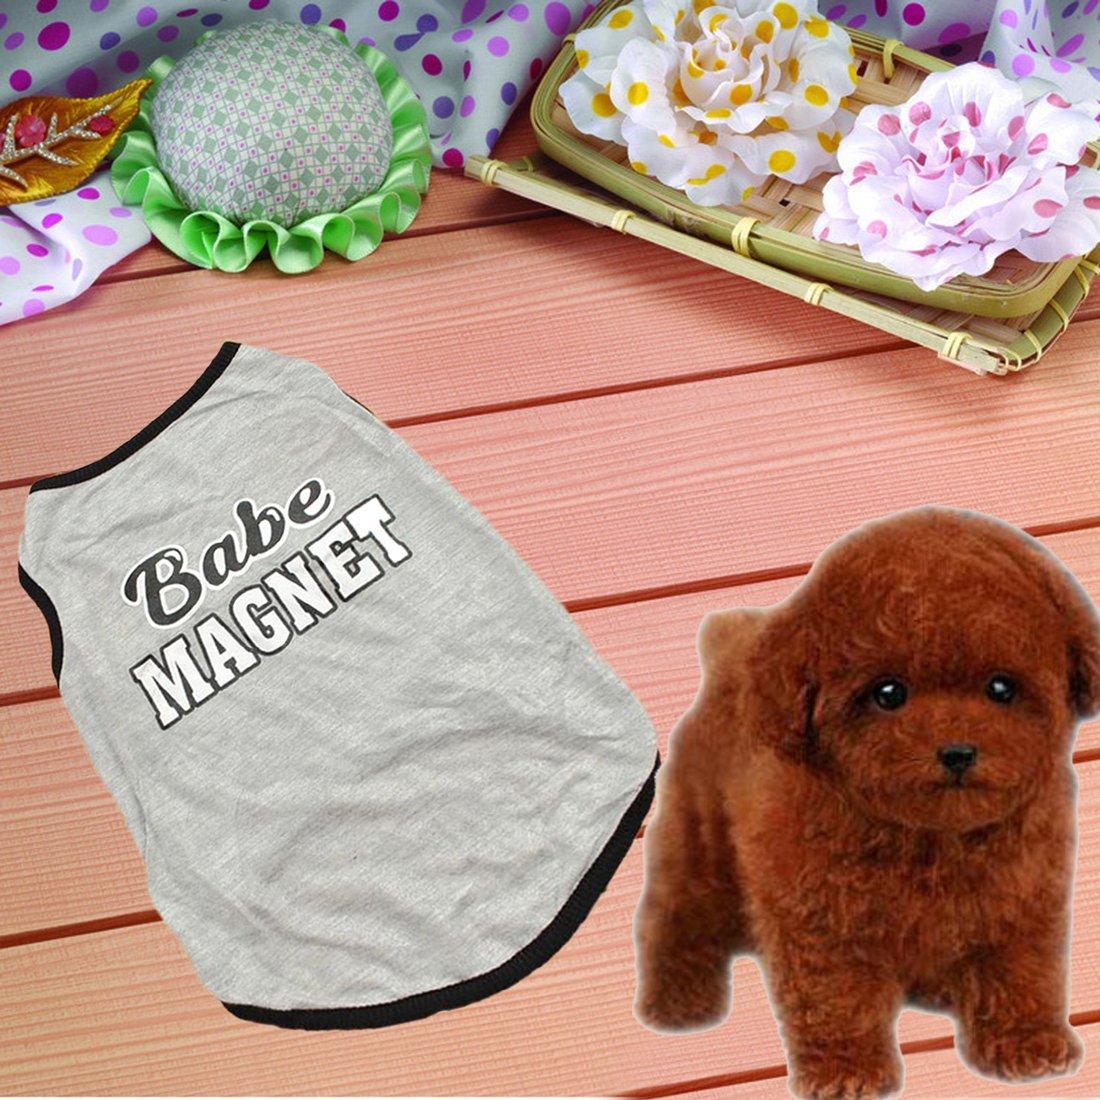 Camiseta de verano CY-buity para perro con el texto en ingl/és Hug Me Kiss Me dise/ño a rayas